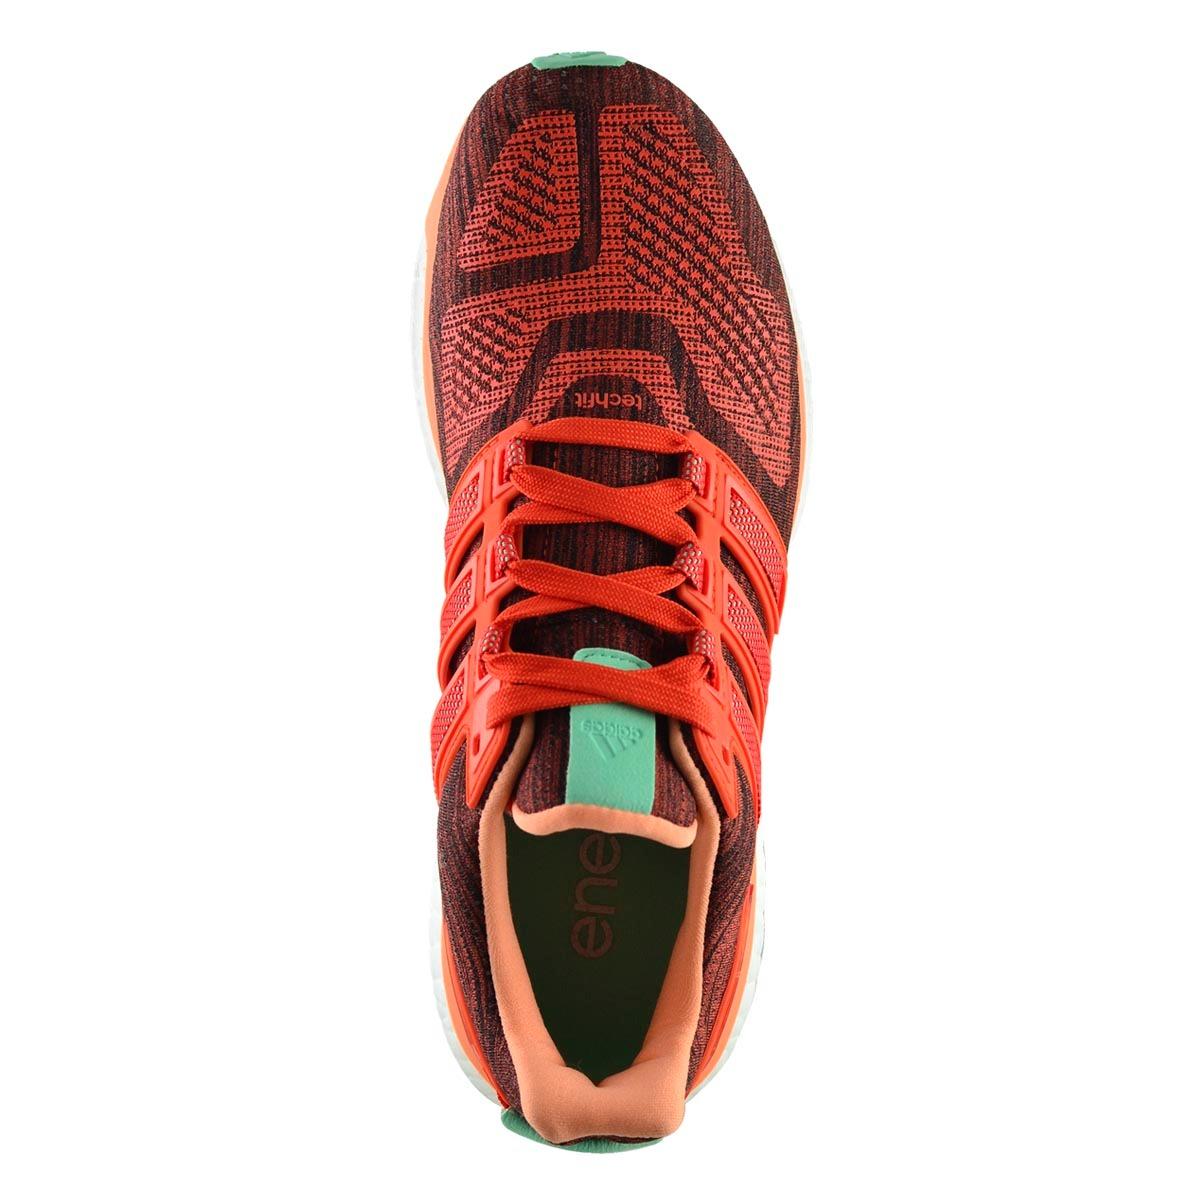 d5934ff8 ... buy sko inkl 200 00 energy boost adidas 3 kvinners 2 oransje xzcq0  c0294 cdfc5